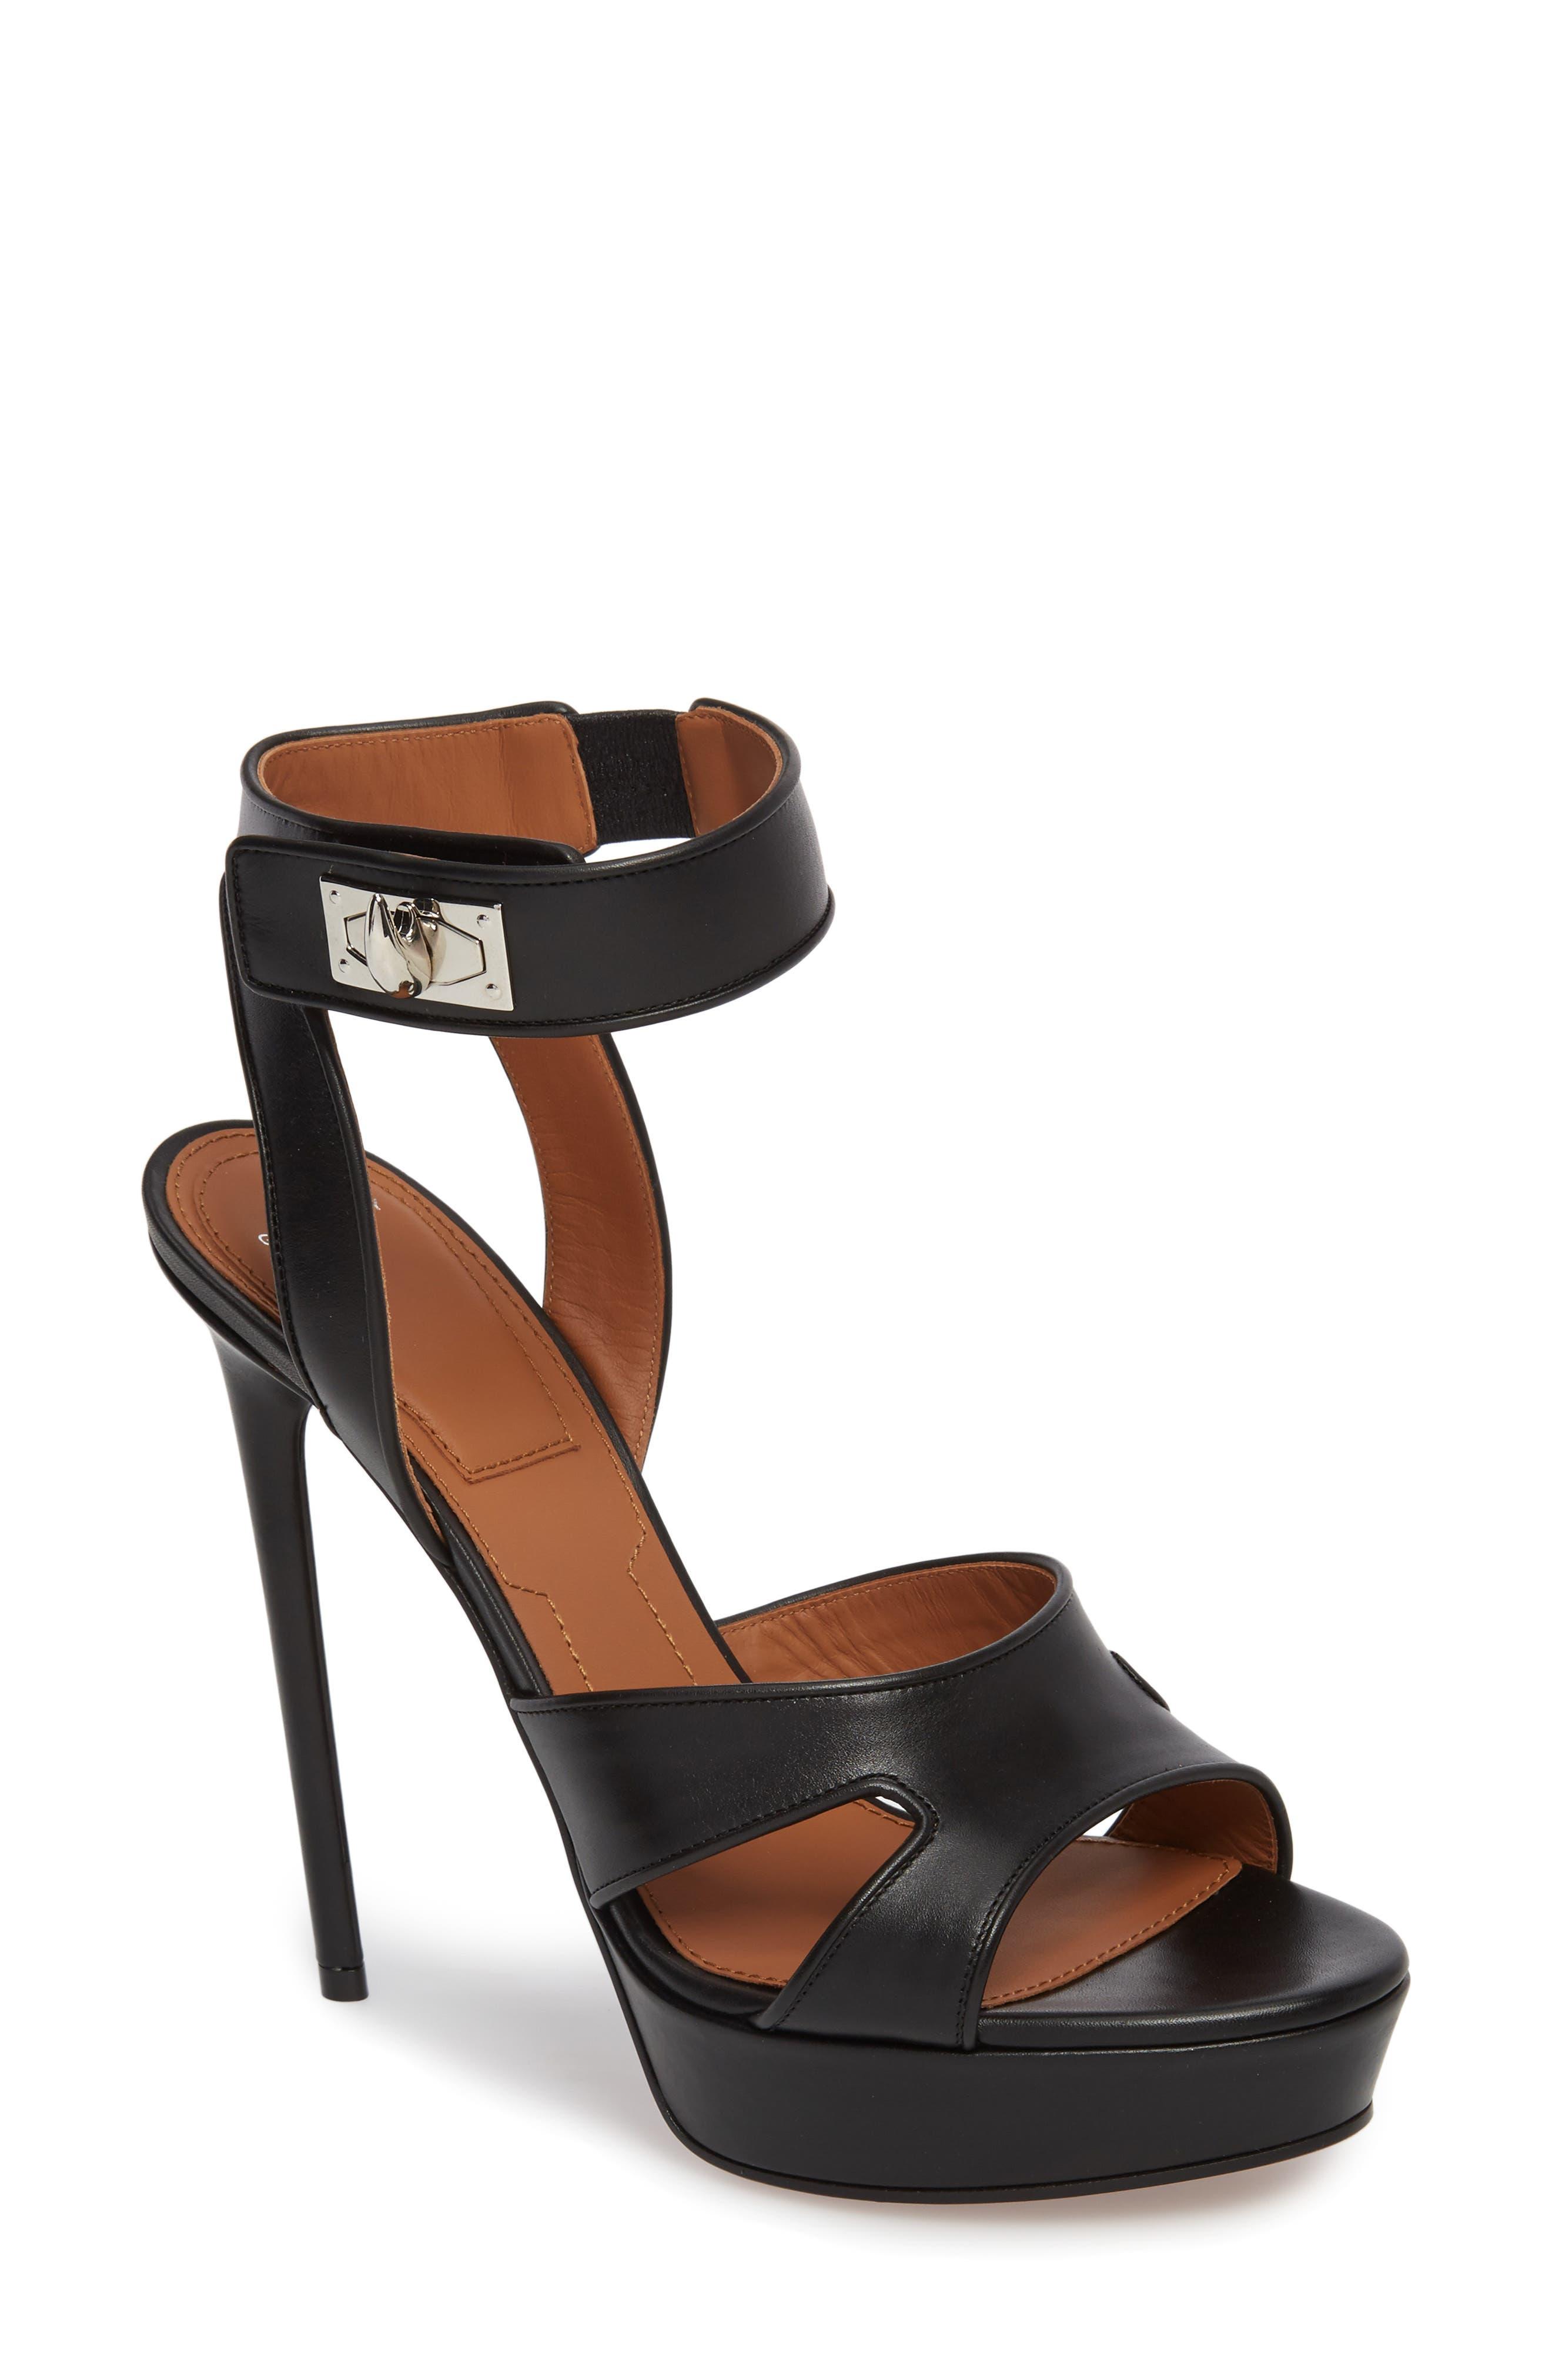 Main Image - Givenchy Shark Tooth Platform Sandal (Women)